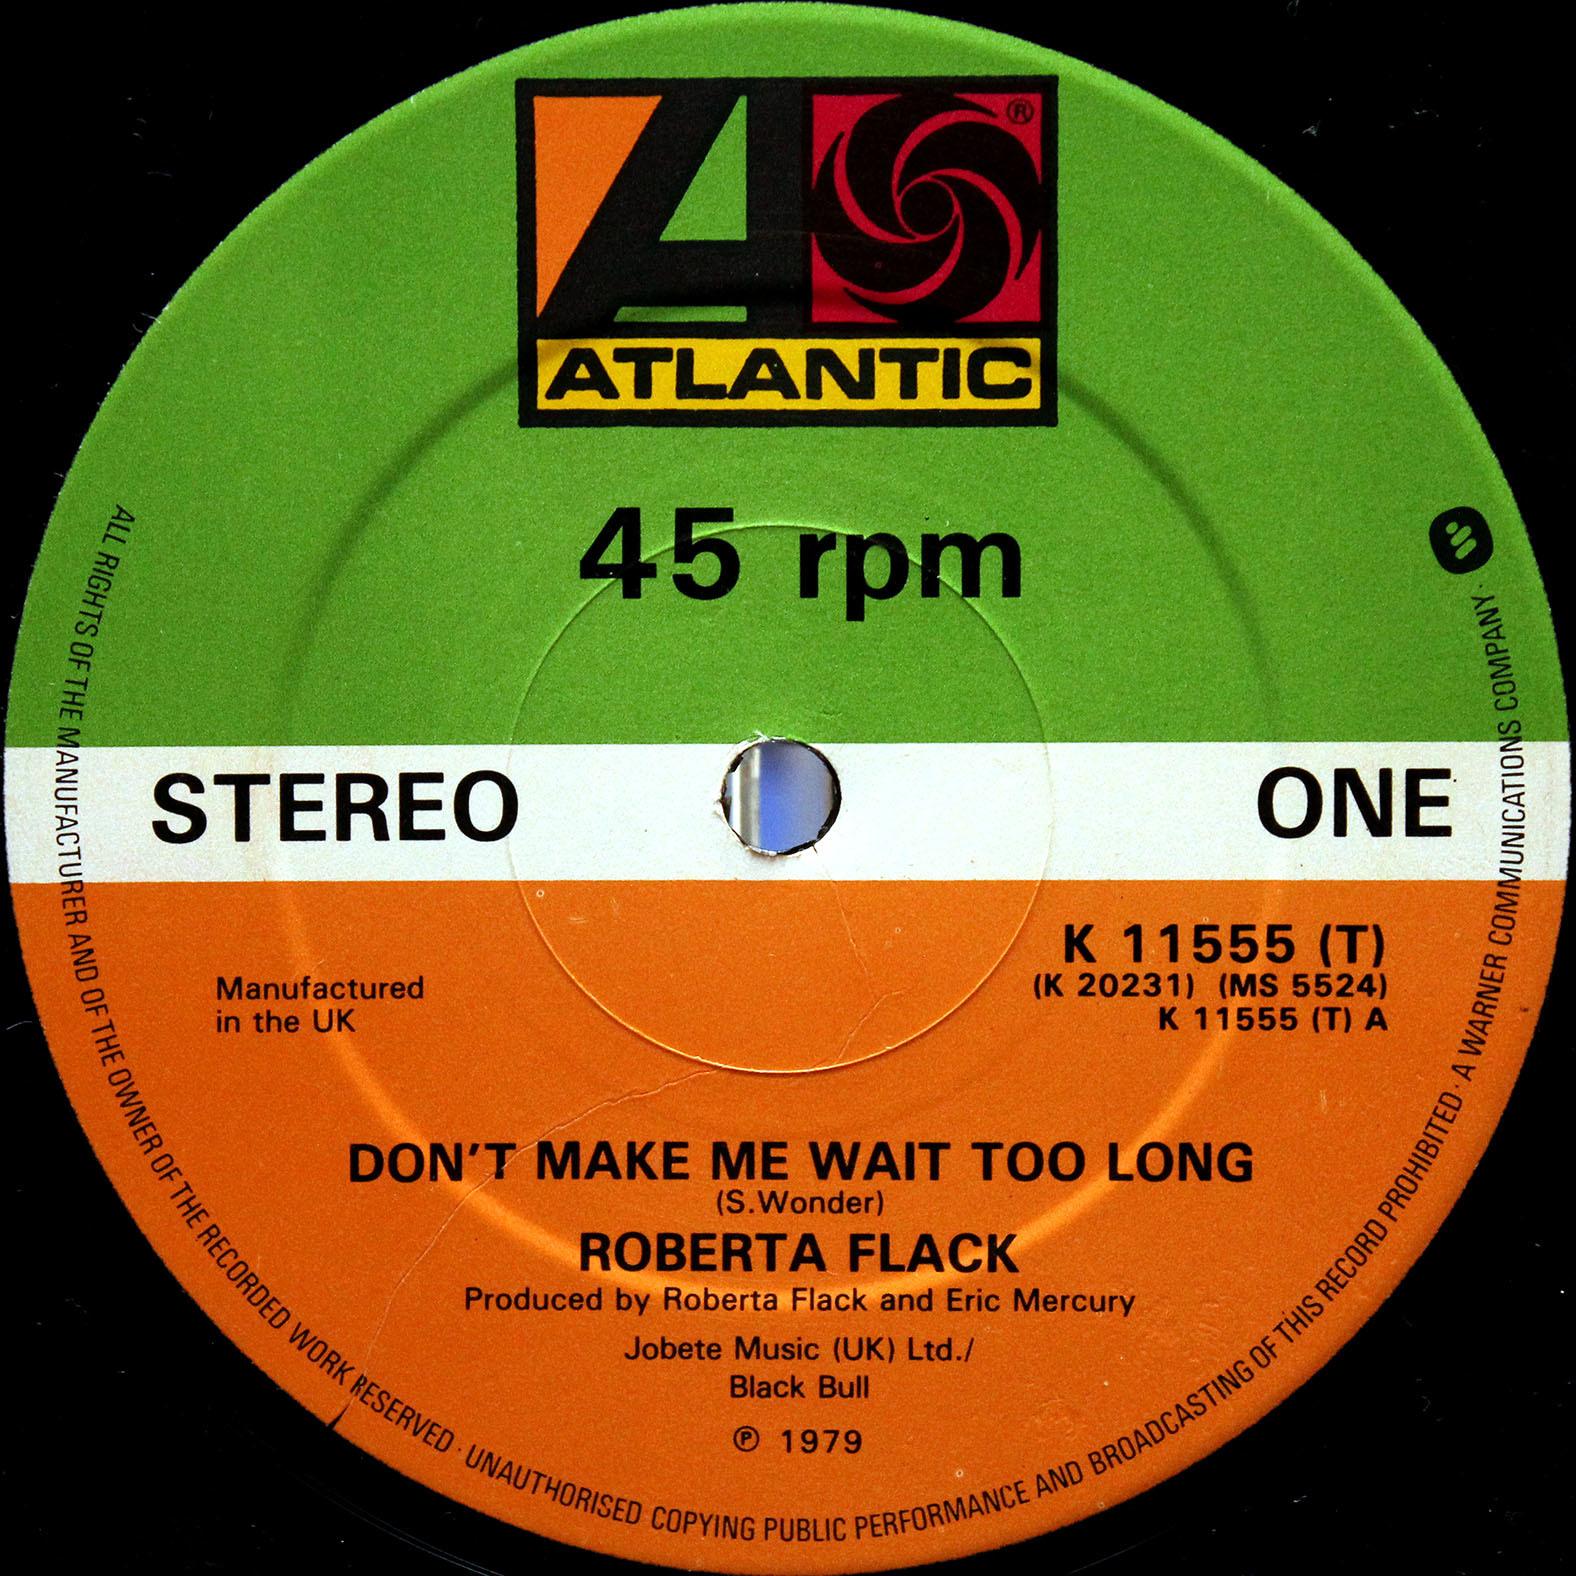 Roberta Flack – Dont Make Me Wait Too Long 03